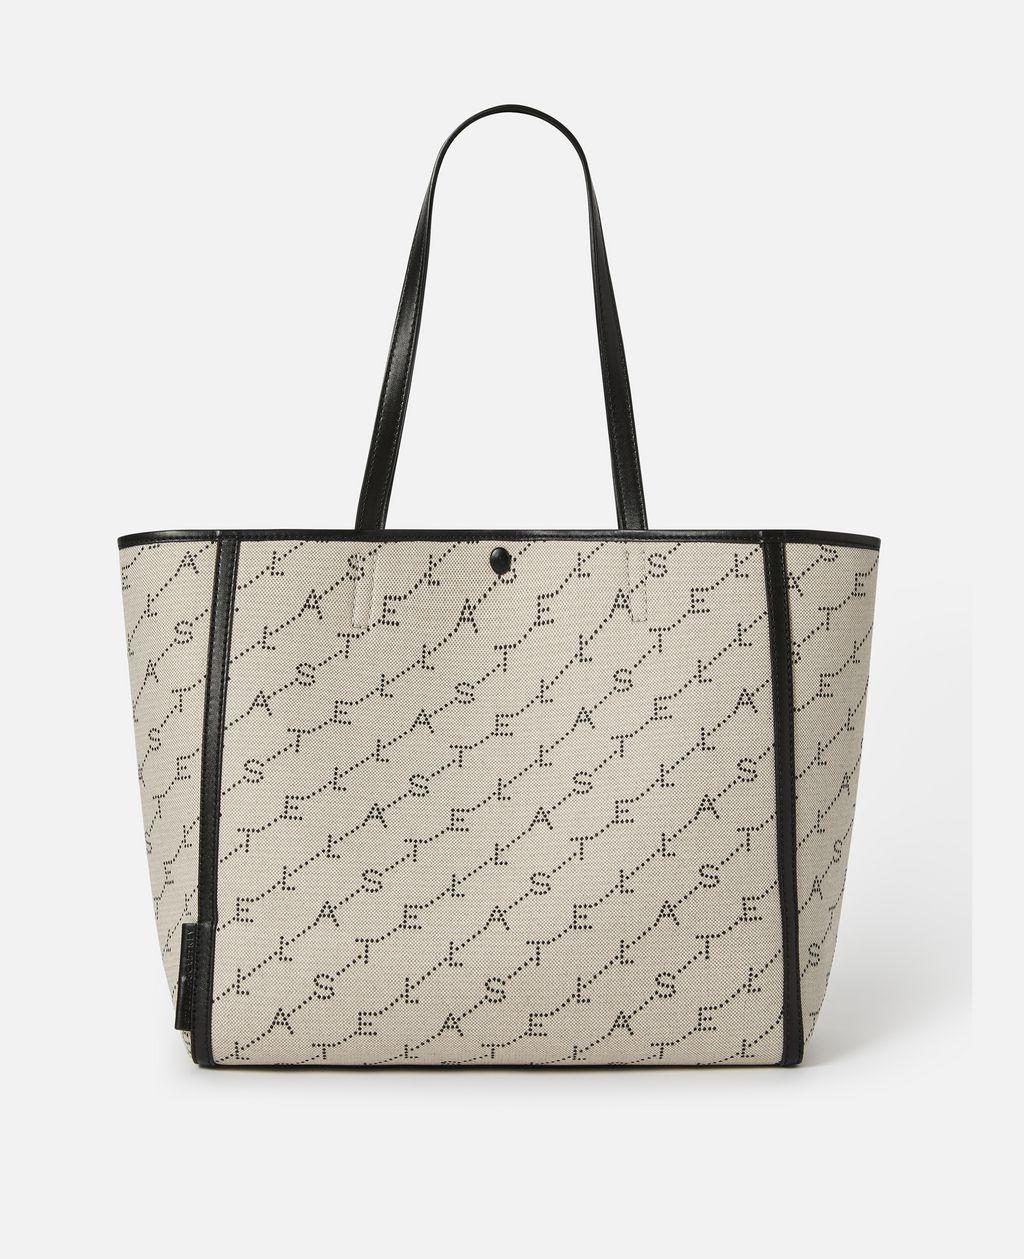 Stella McCartney Tote Bag - $795